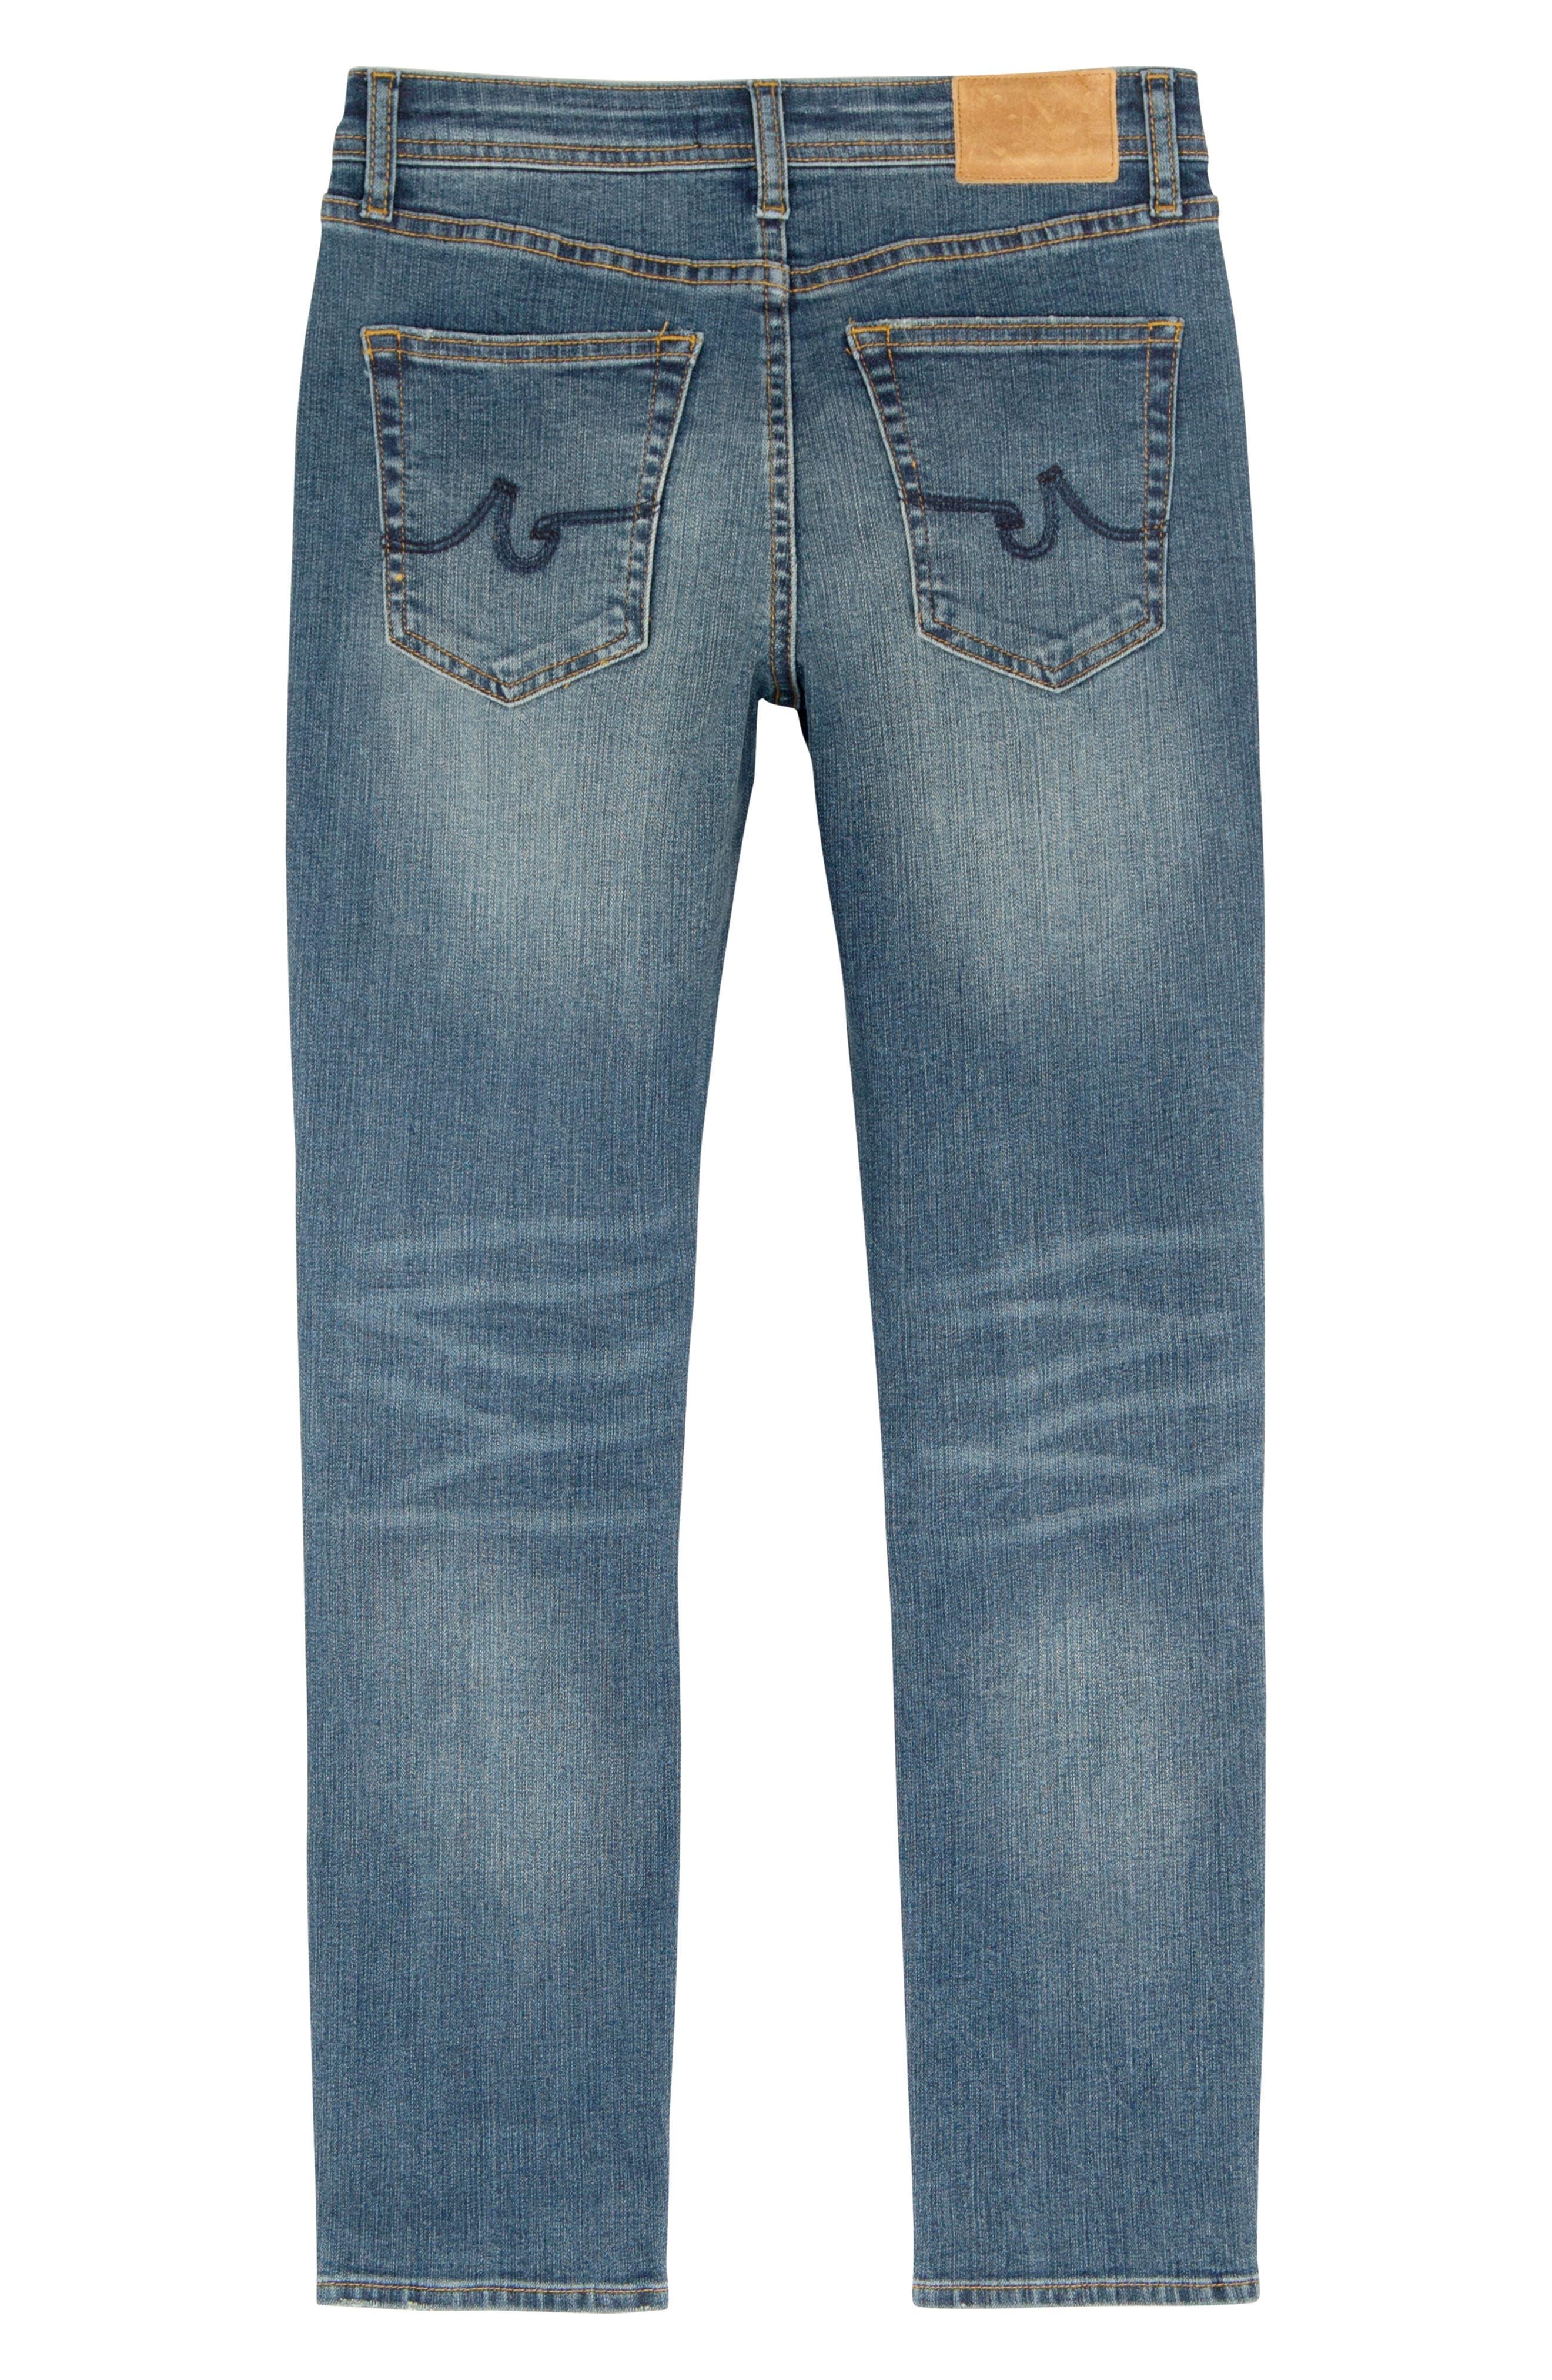 AG ADRIANO GOLDSCHMIED KIDS, The Stryker Slim Straight Leg Jeans, Alternate thumbnail 2, color, HIPPIE SKY